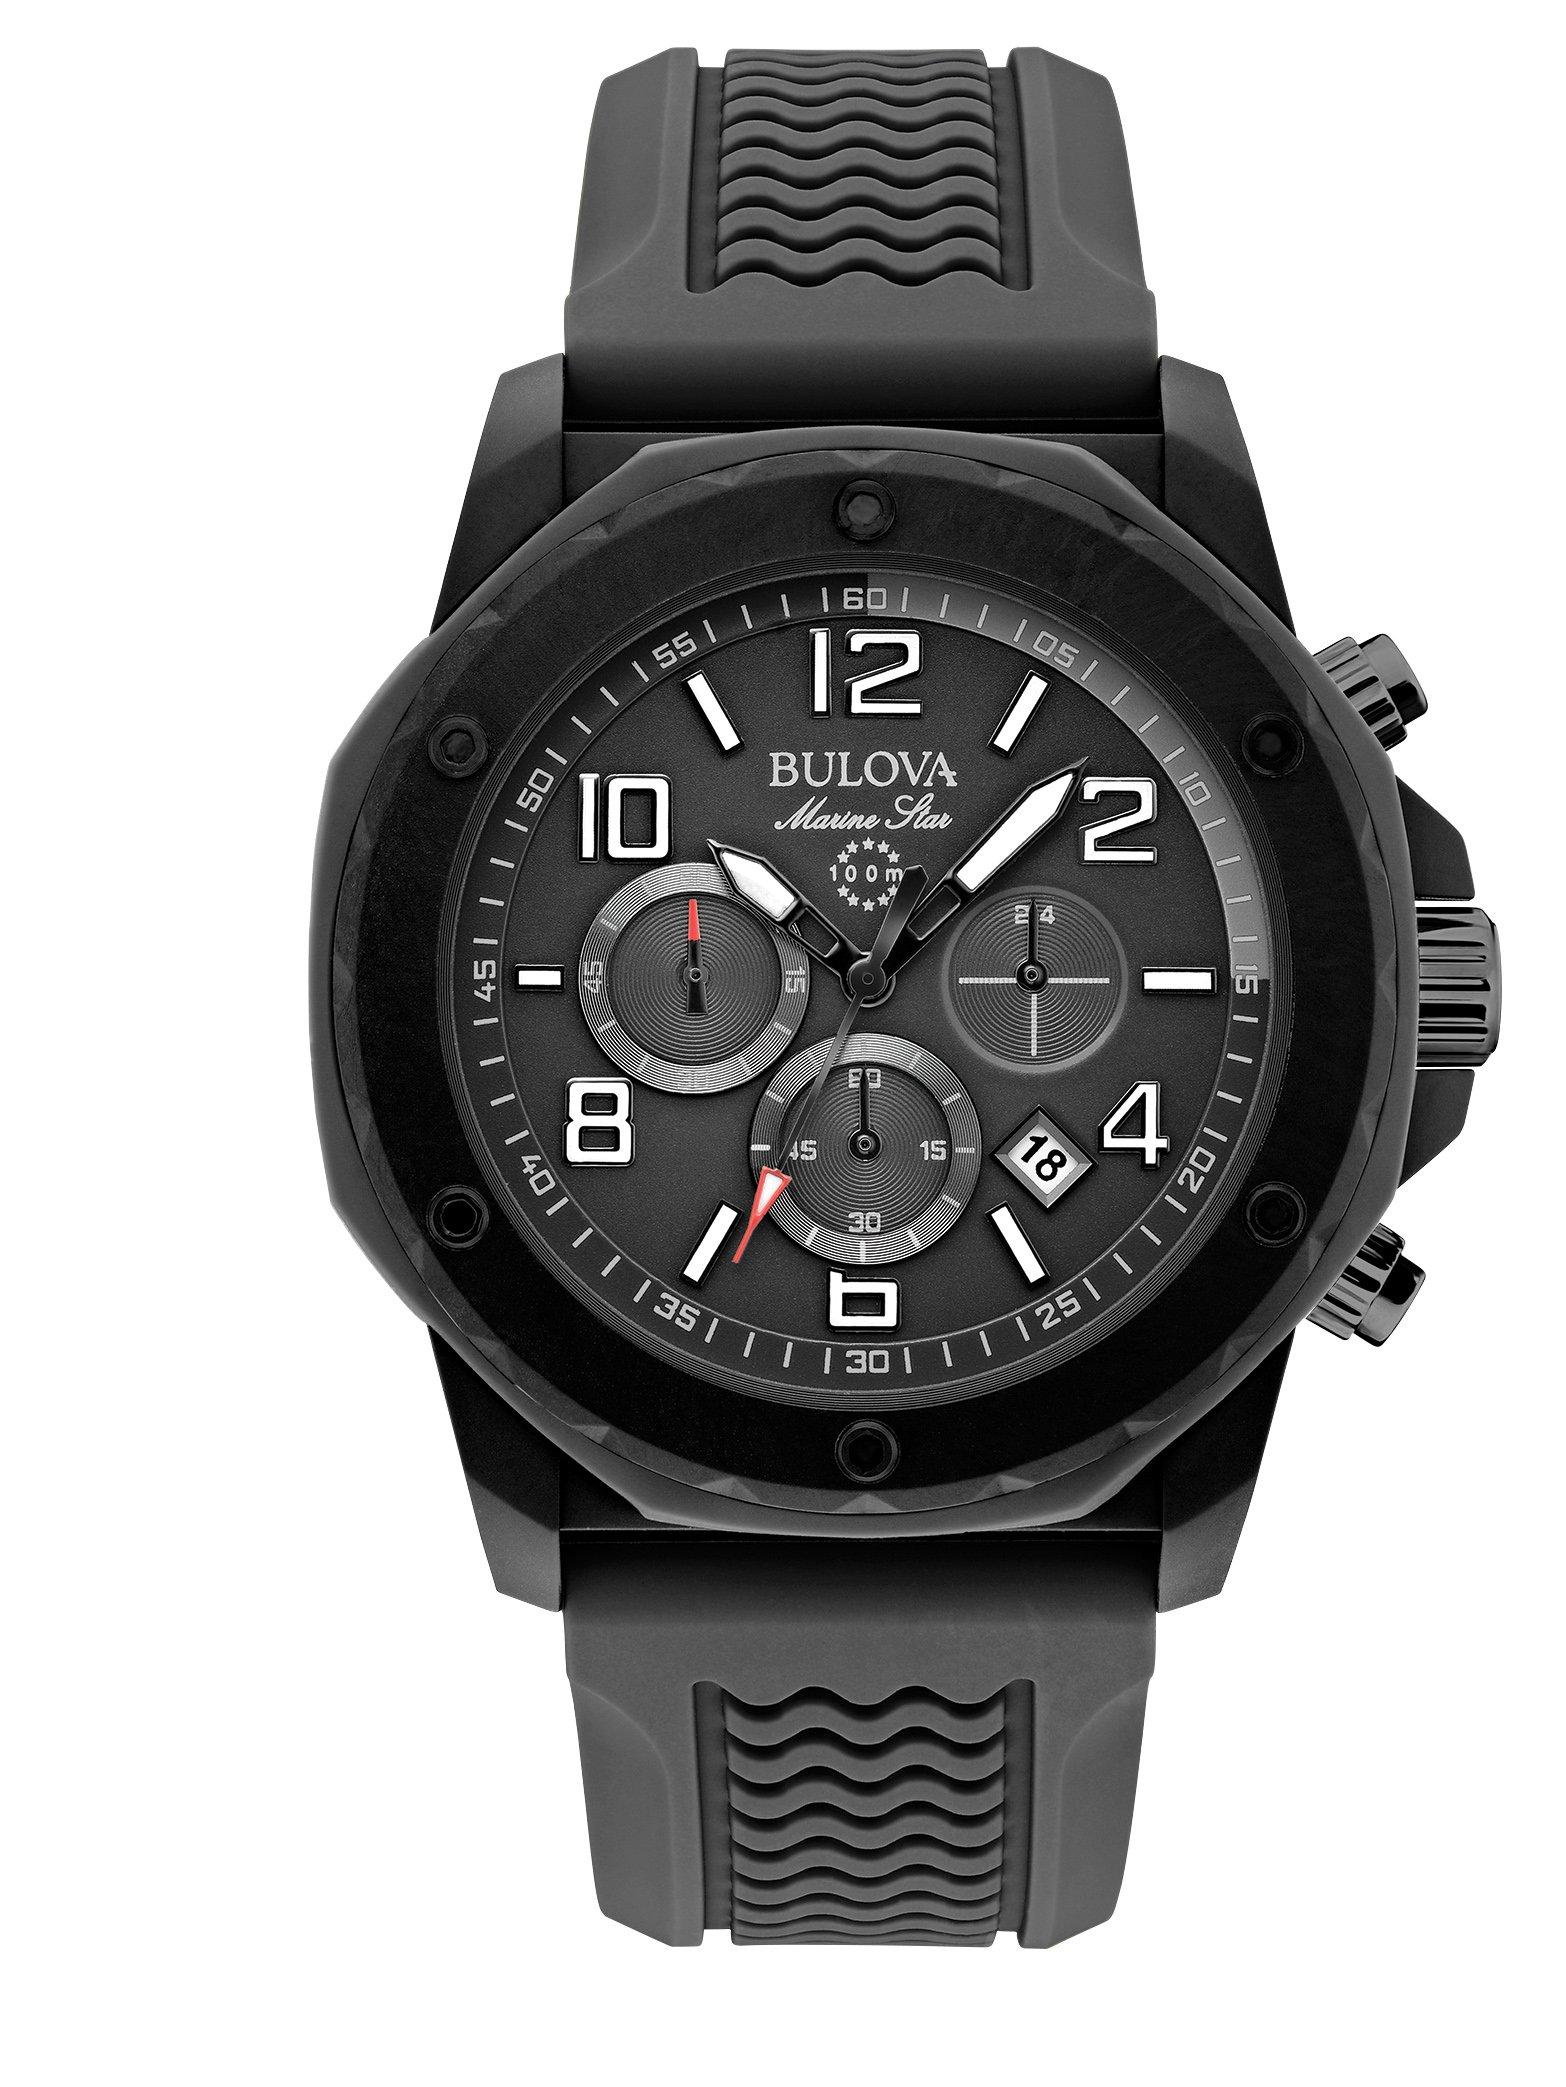 Bulova Marine Star Black Dial SS Rubber Chrono Quartz Men's Watch 98B223 by Bulova